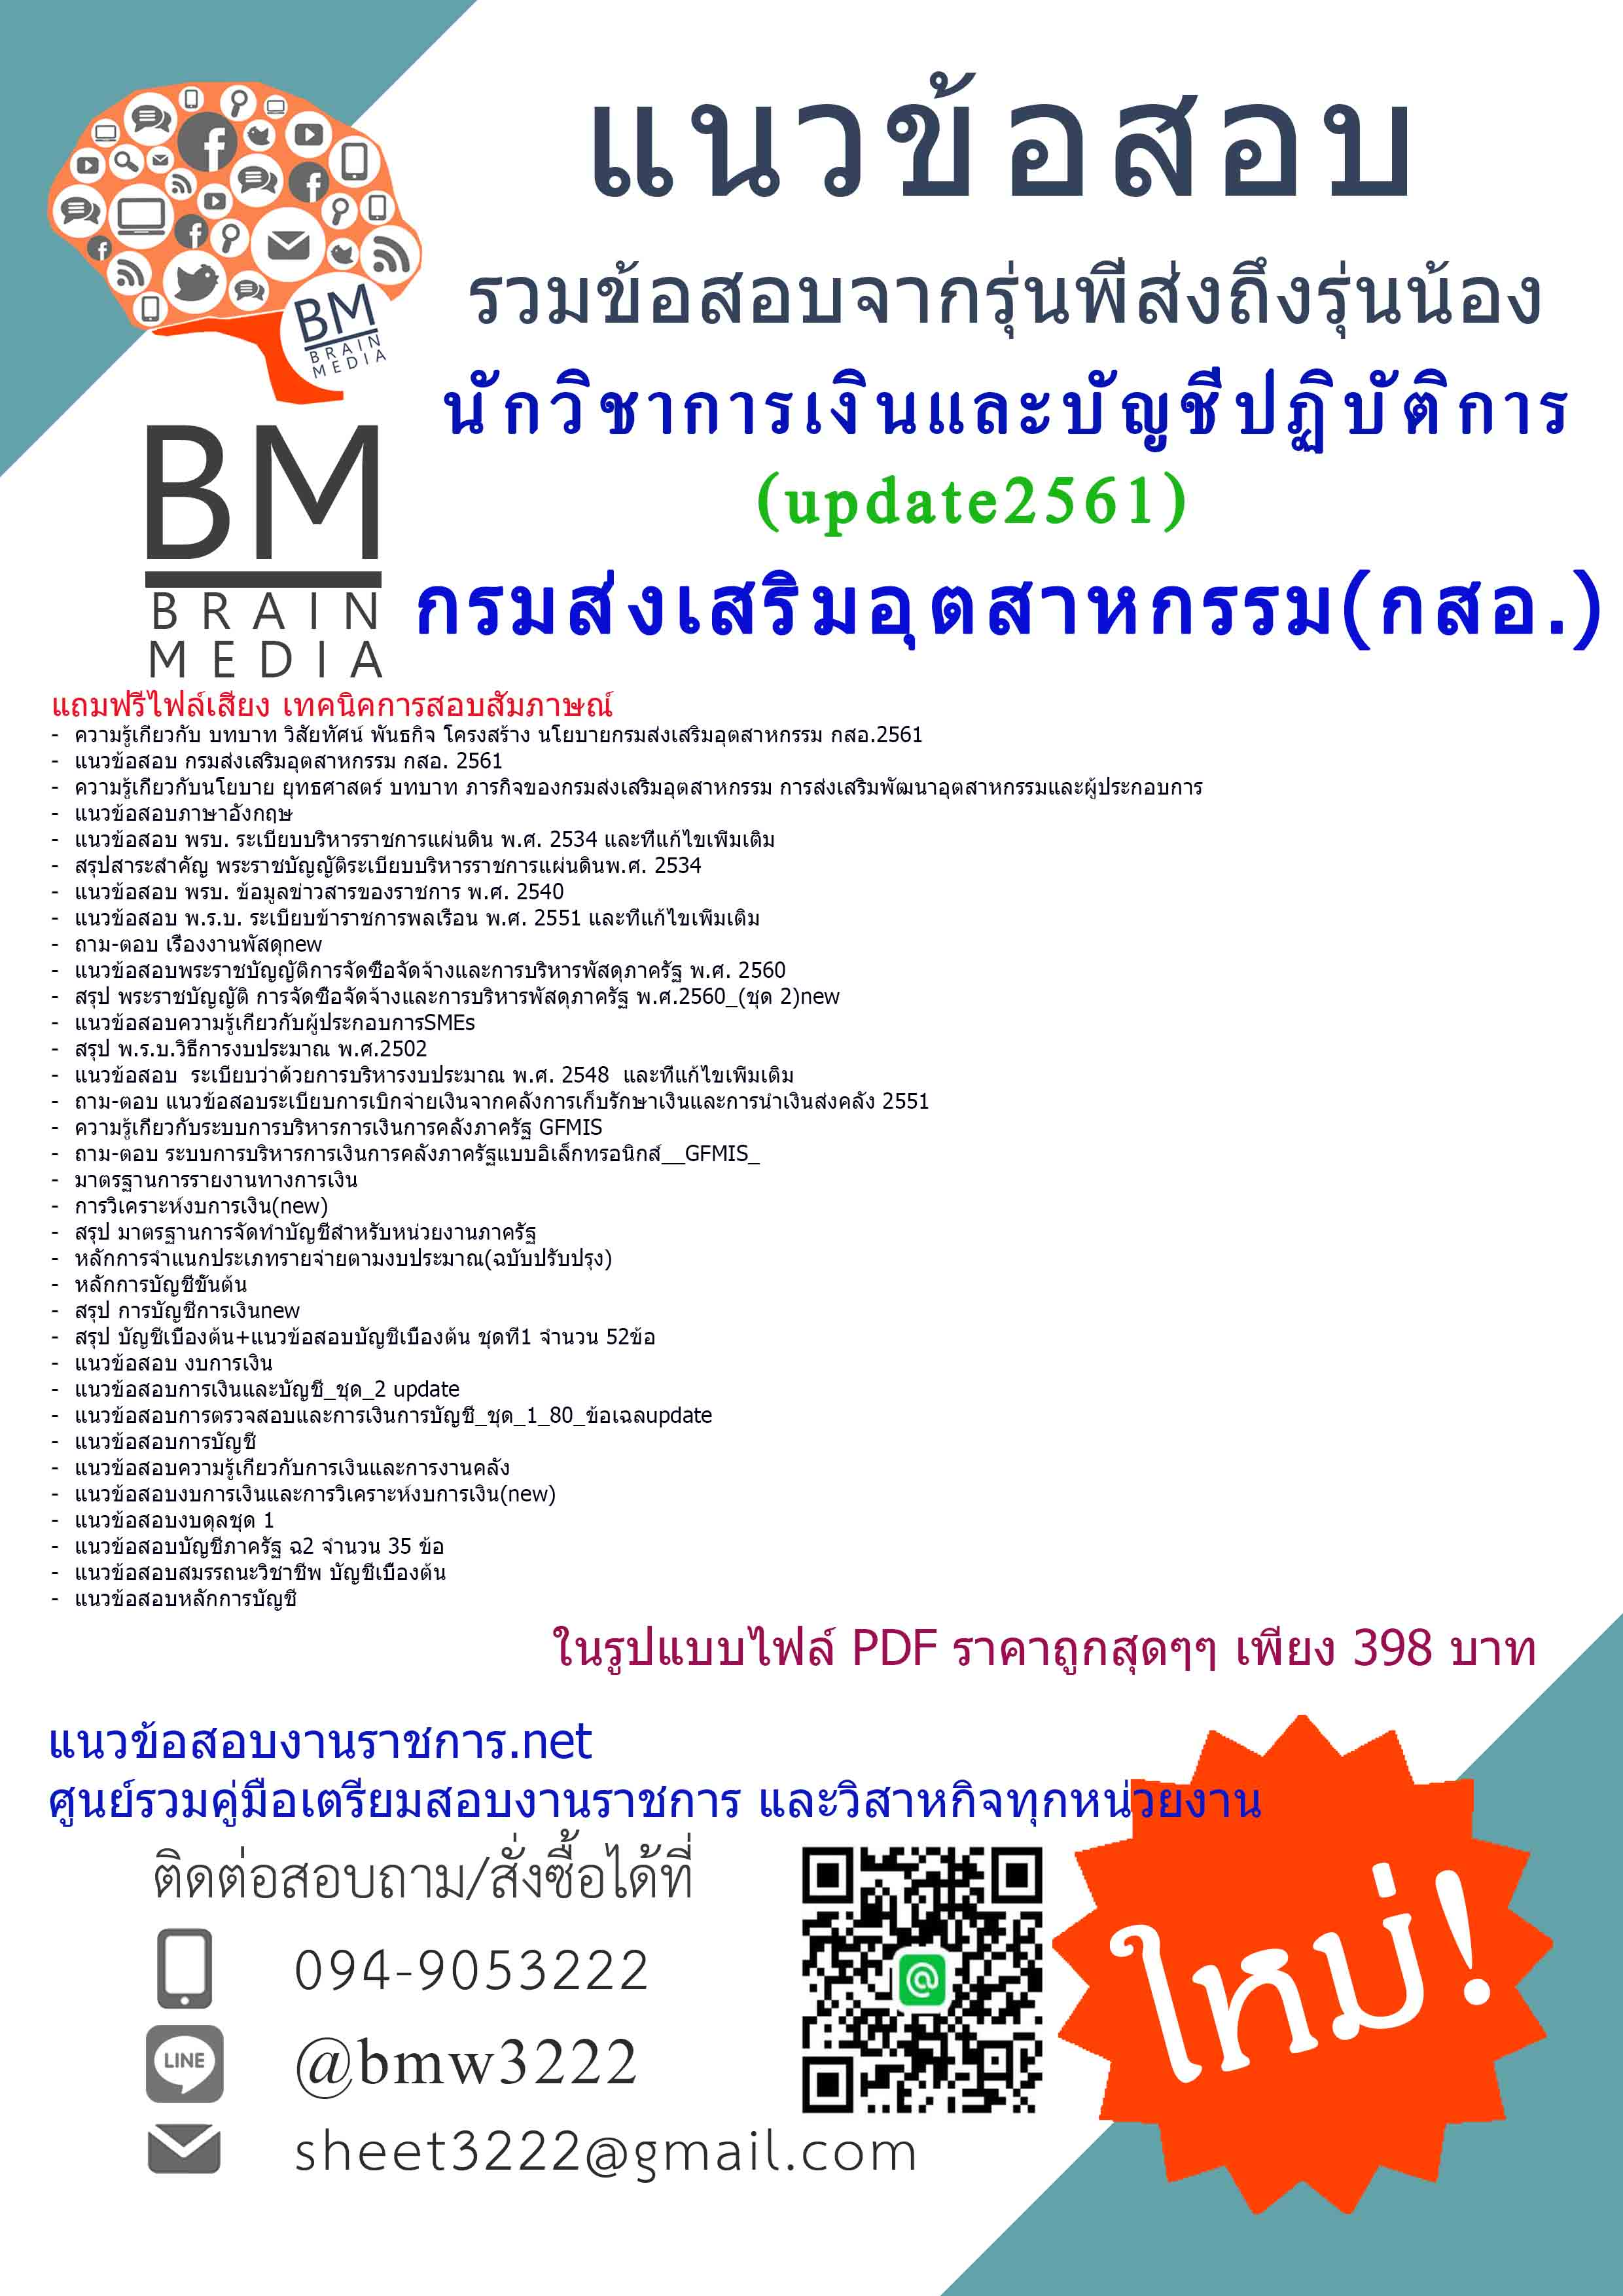 (((newupdateสุดๆ))) แนวข้อสอบนักวิชาการเงินและบัญชีปฏิบัติการกรมส่งเสริมอุตสาหกรรม (กสอ.)2561